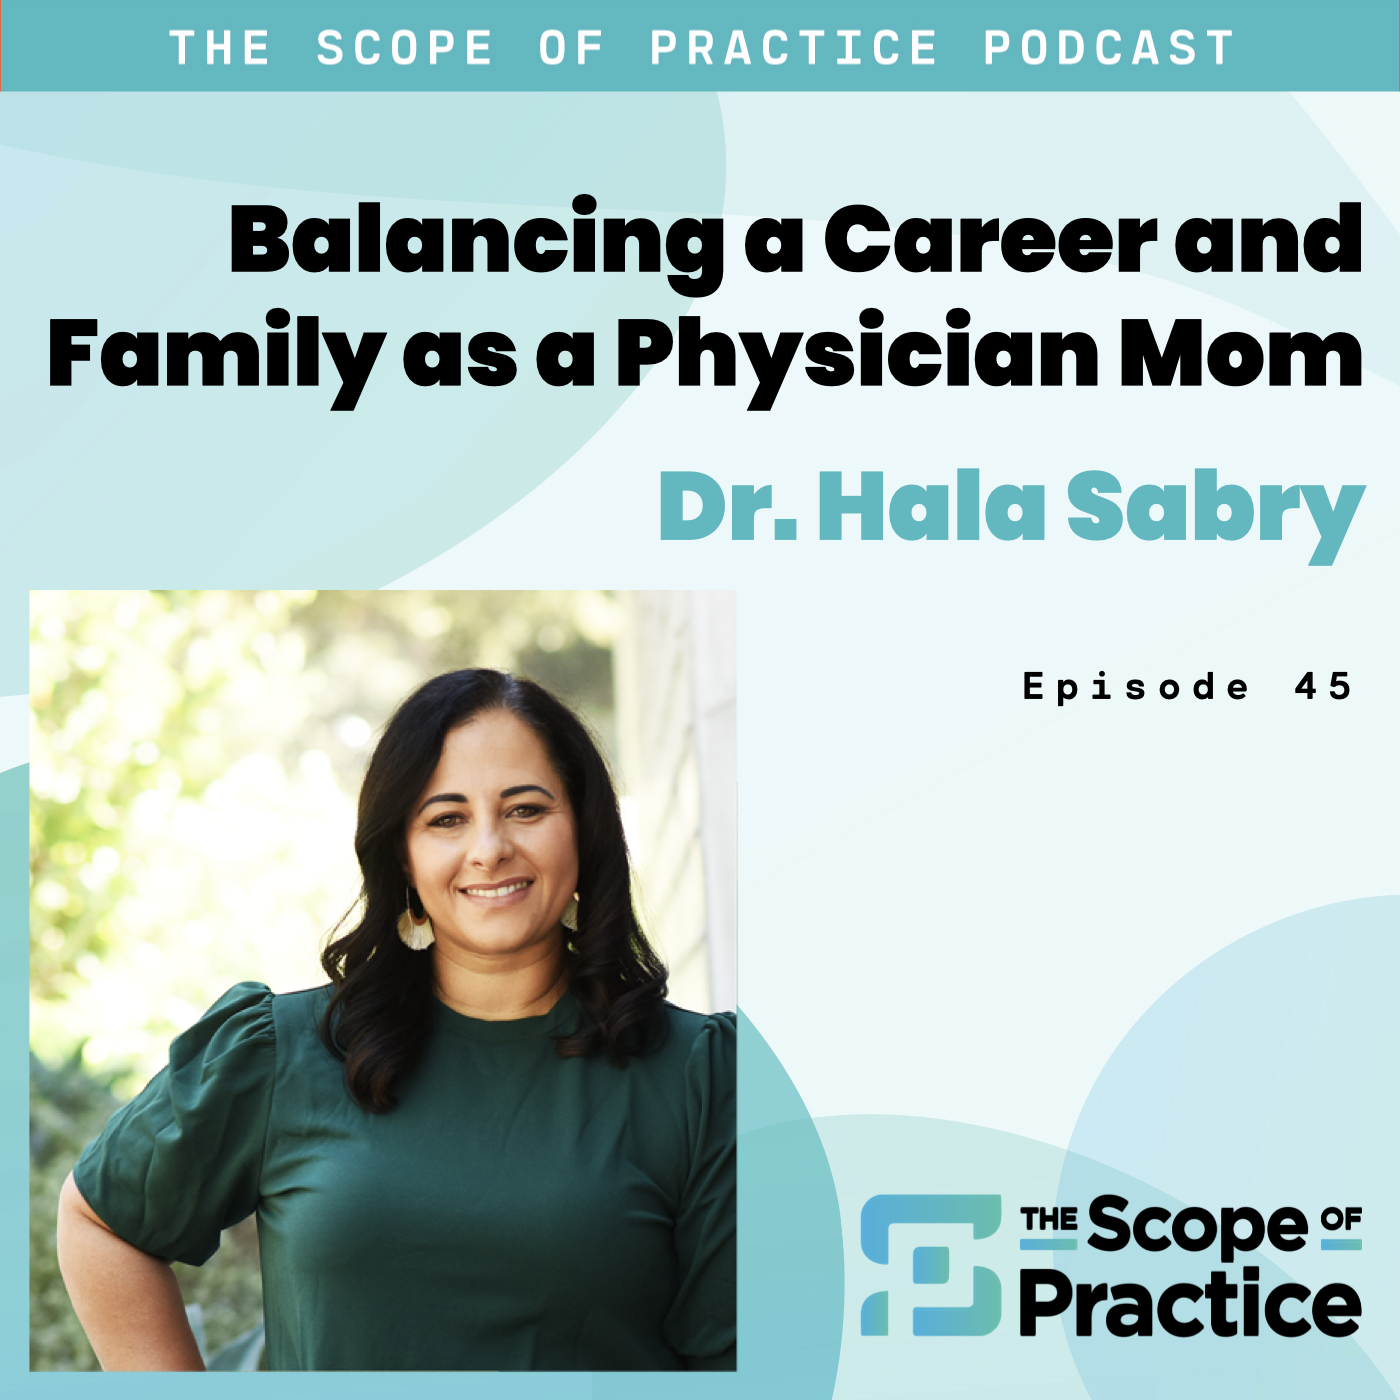 Physician Mom Dr. Hala Sabry